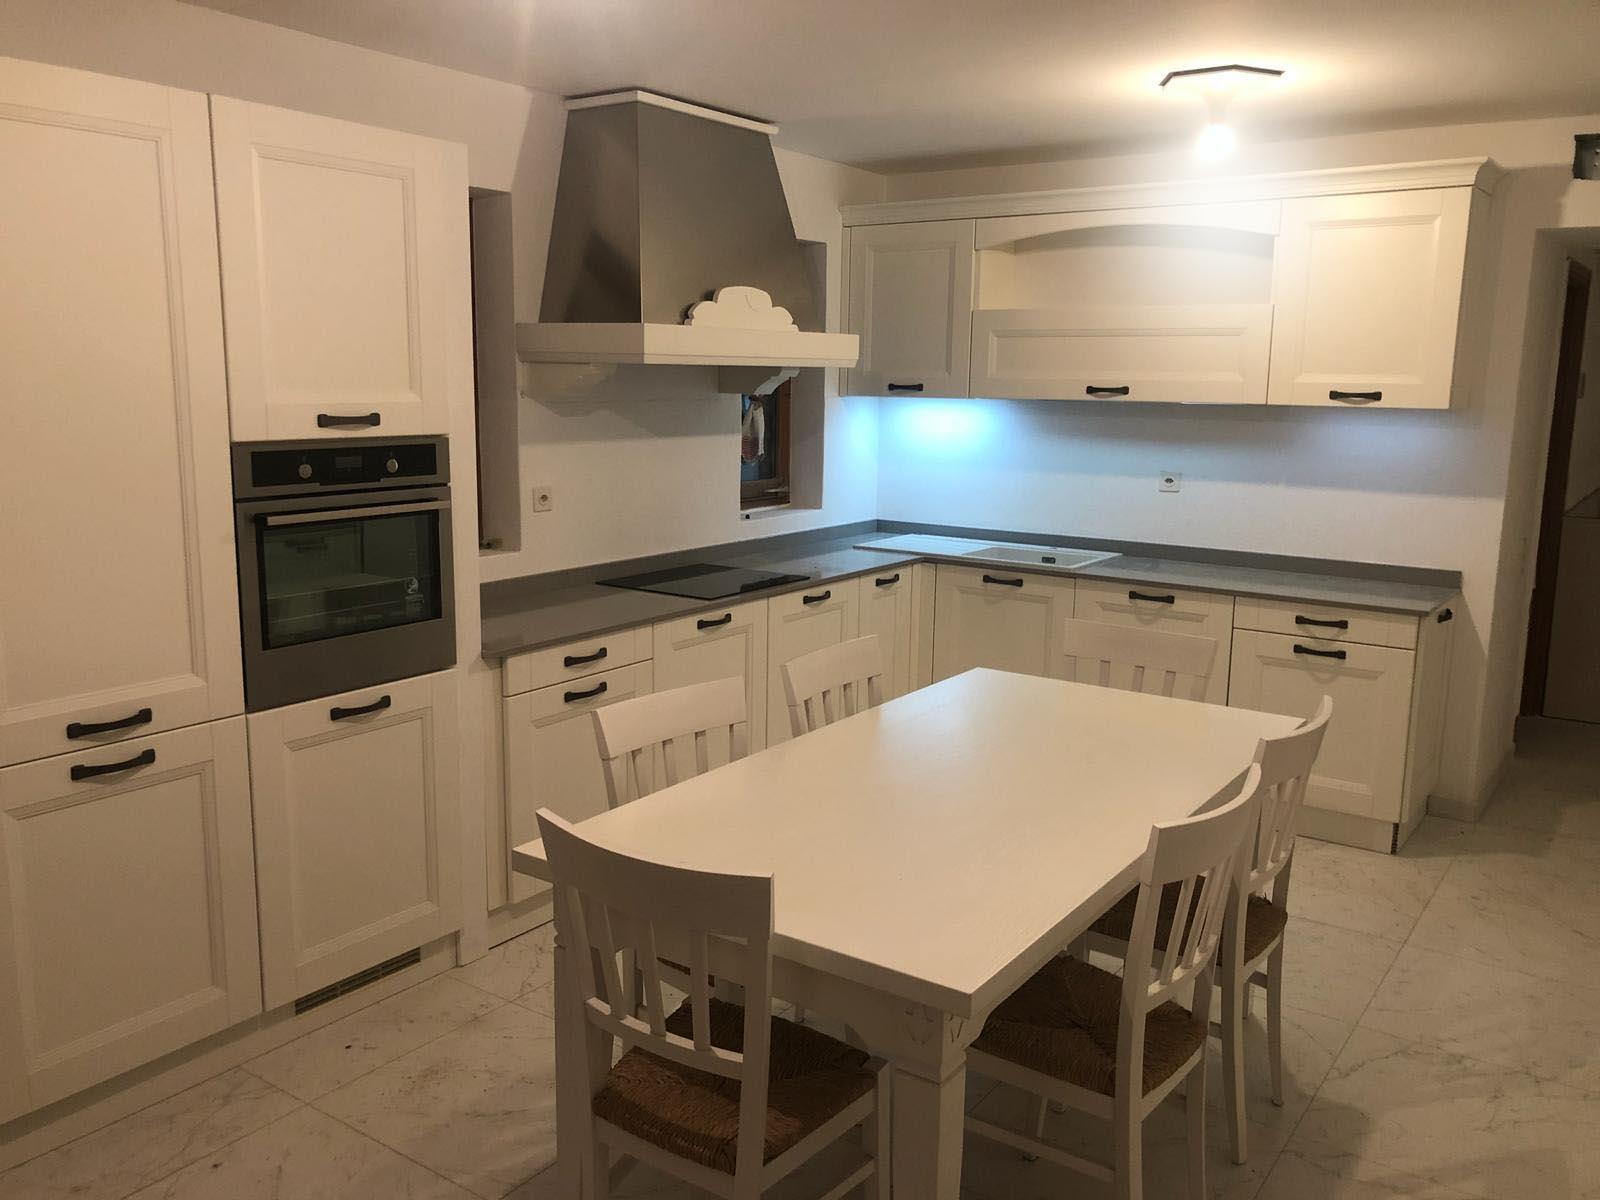 Cucine Per Chalet Di Montagna lo chalet di montagna – real time casa